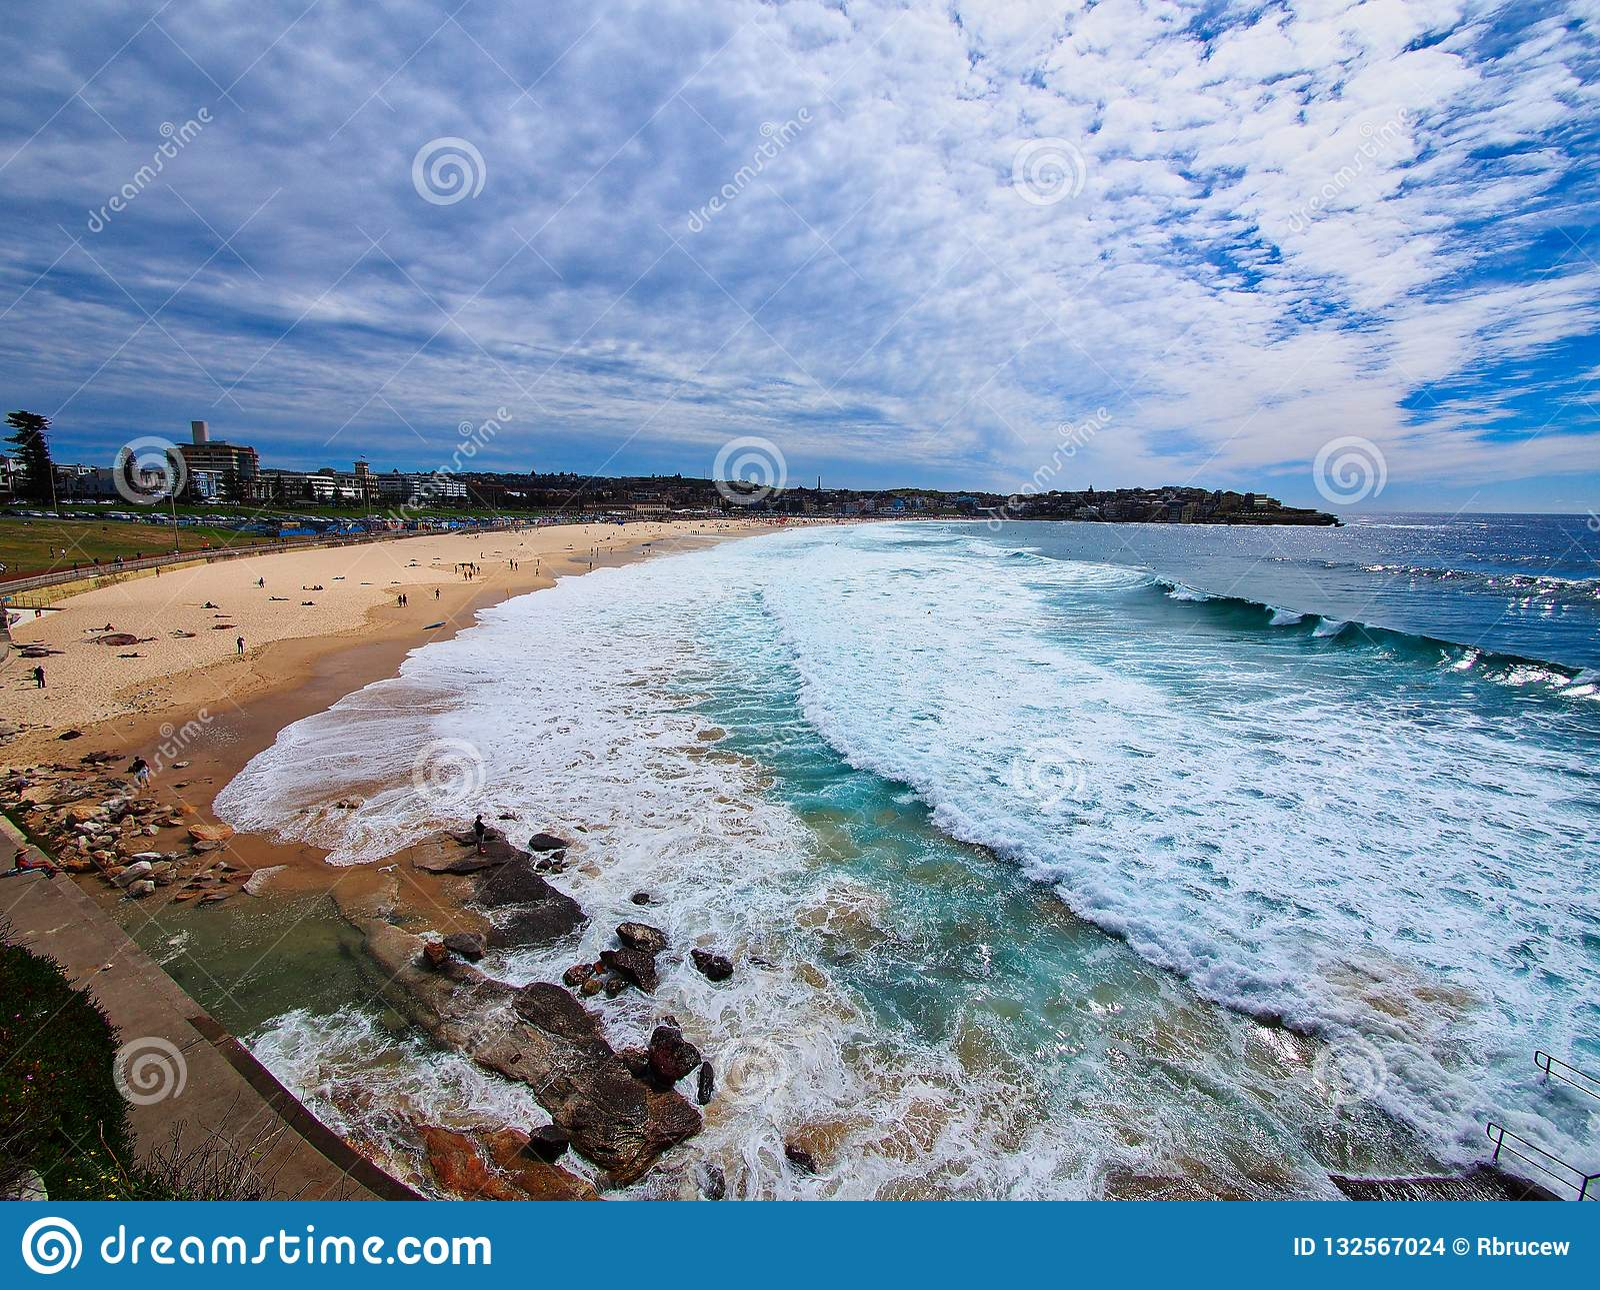 Pacific Ocean Waves at Bondi Beach, Sydney, Australia